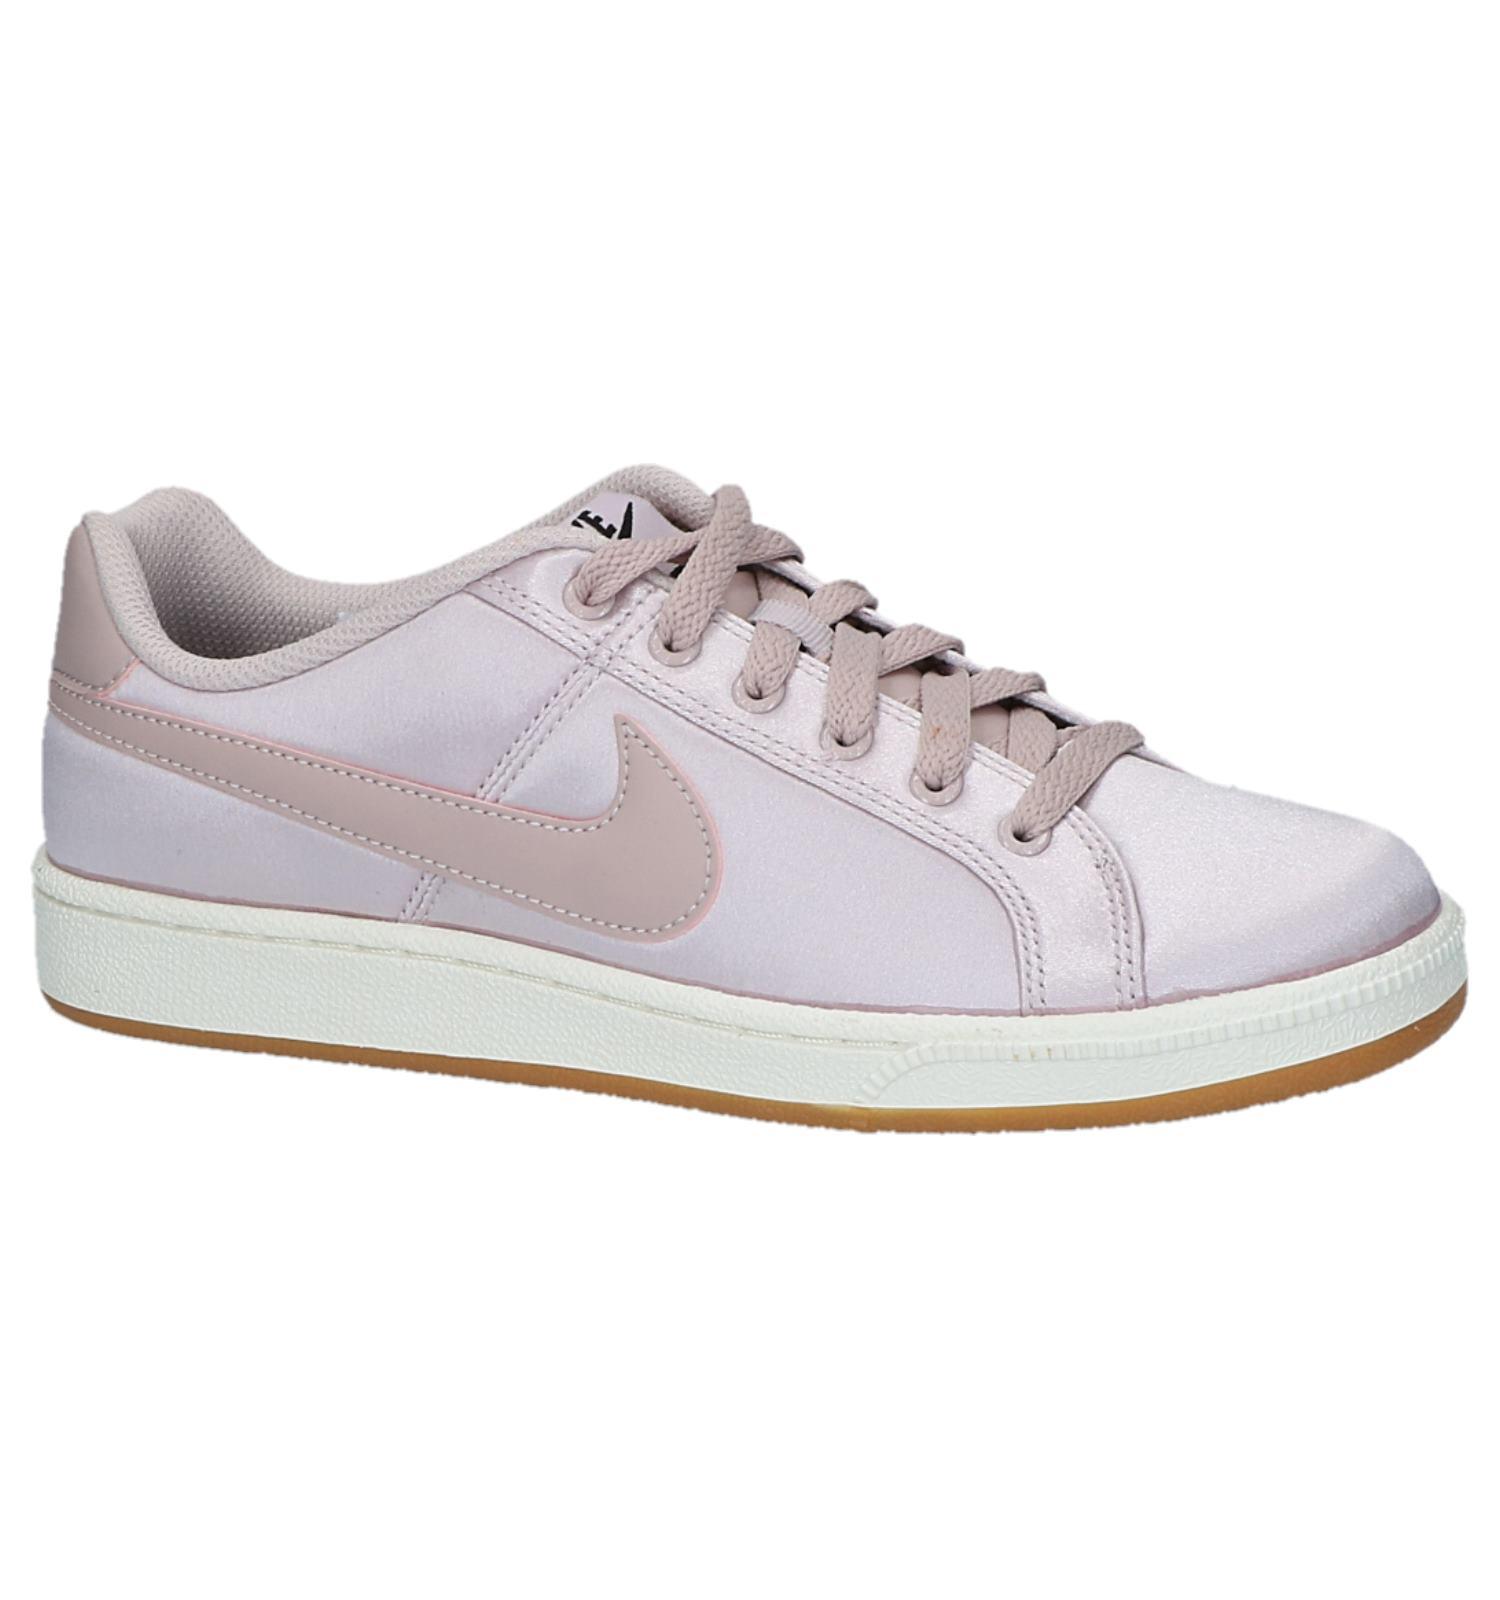 c5a542f2b5c Nike Court Royale Sneakers Roze   TORFS.BE   Gratis verzend en retour